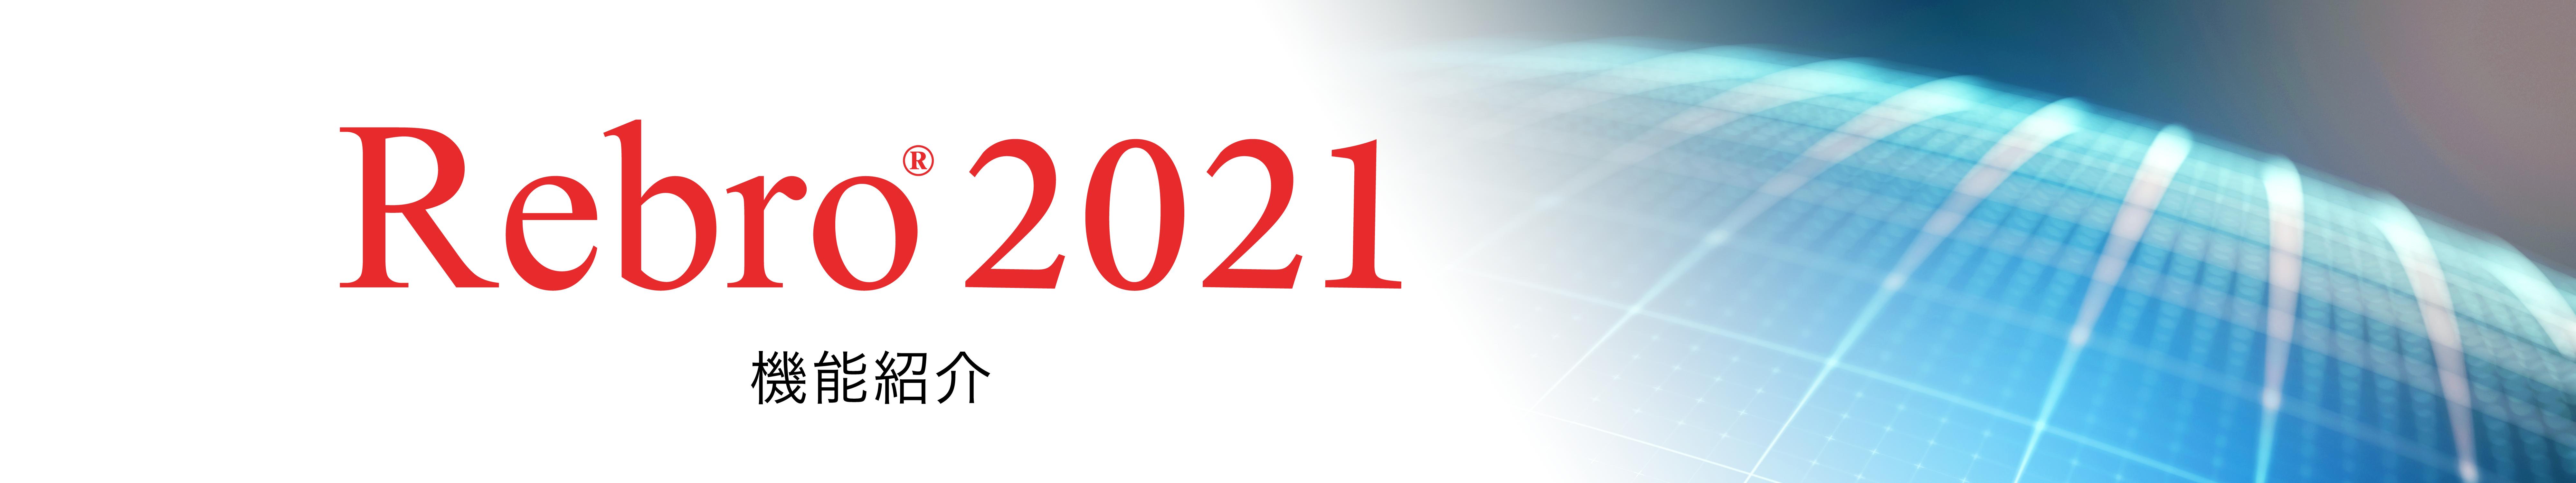 Rebro 2021新機能情報